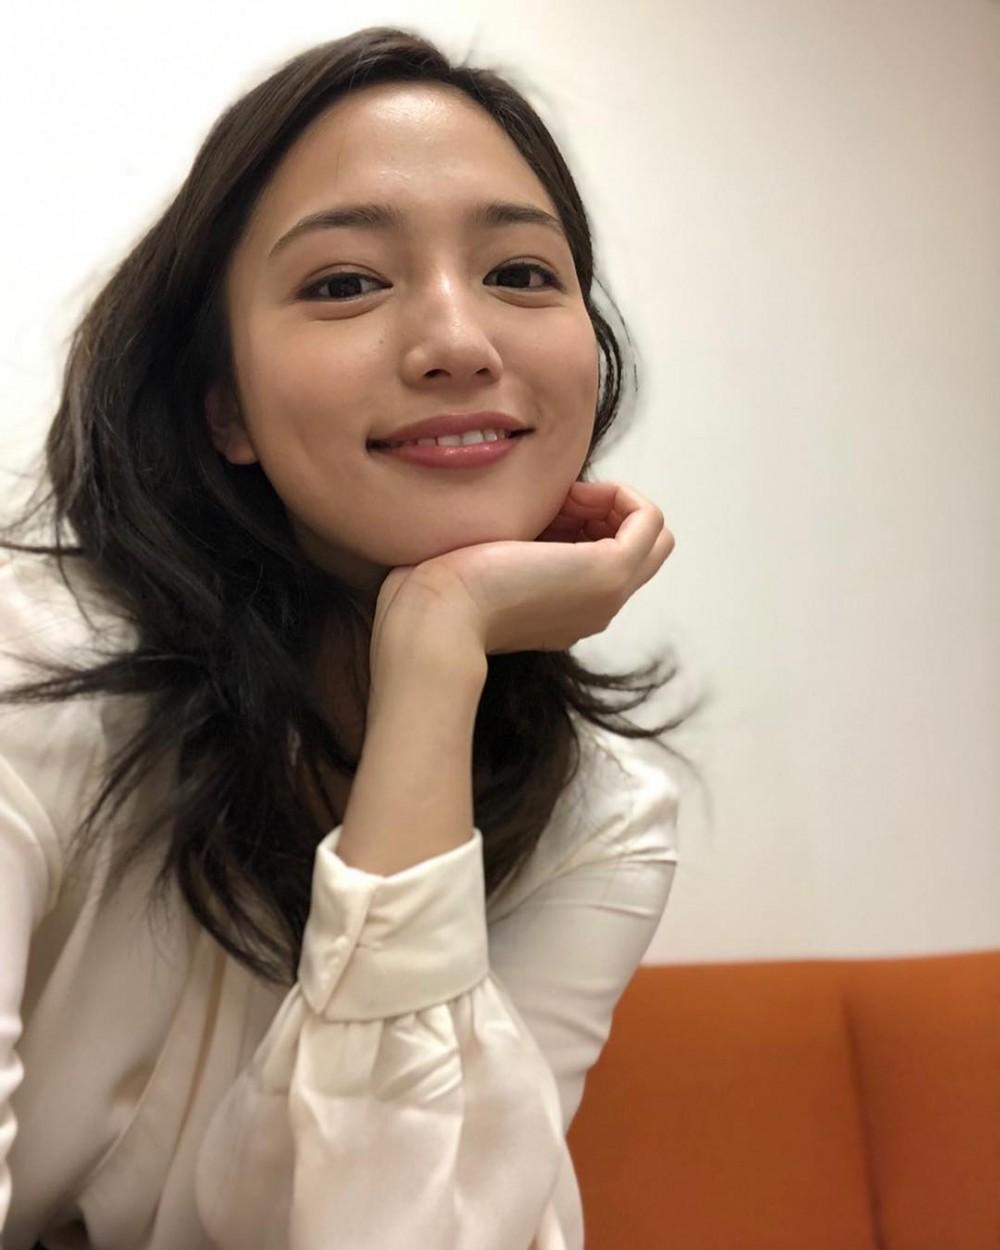 haruna_kawaguchi_official